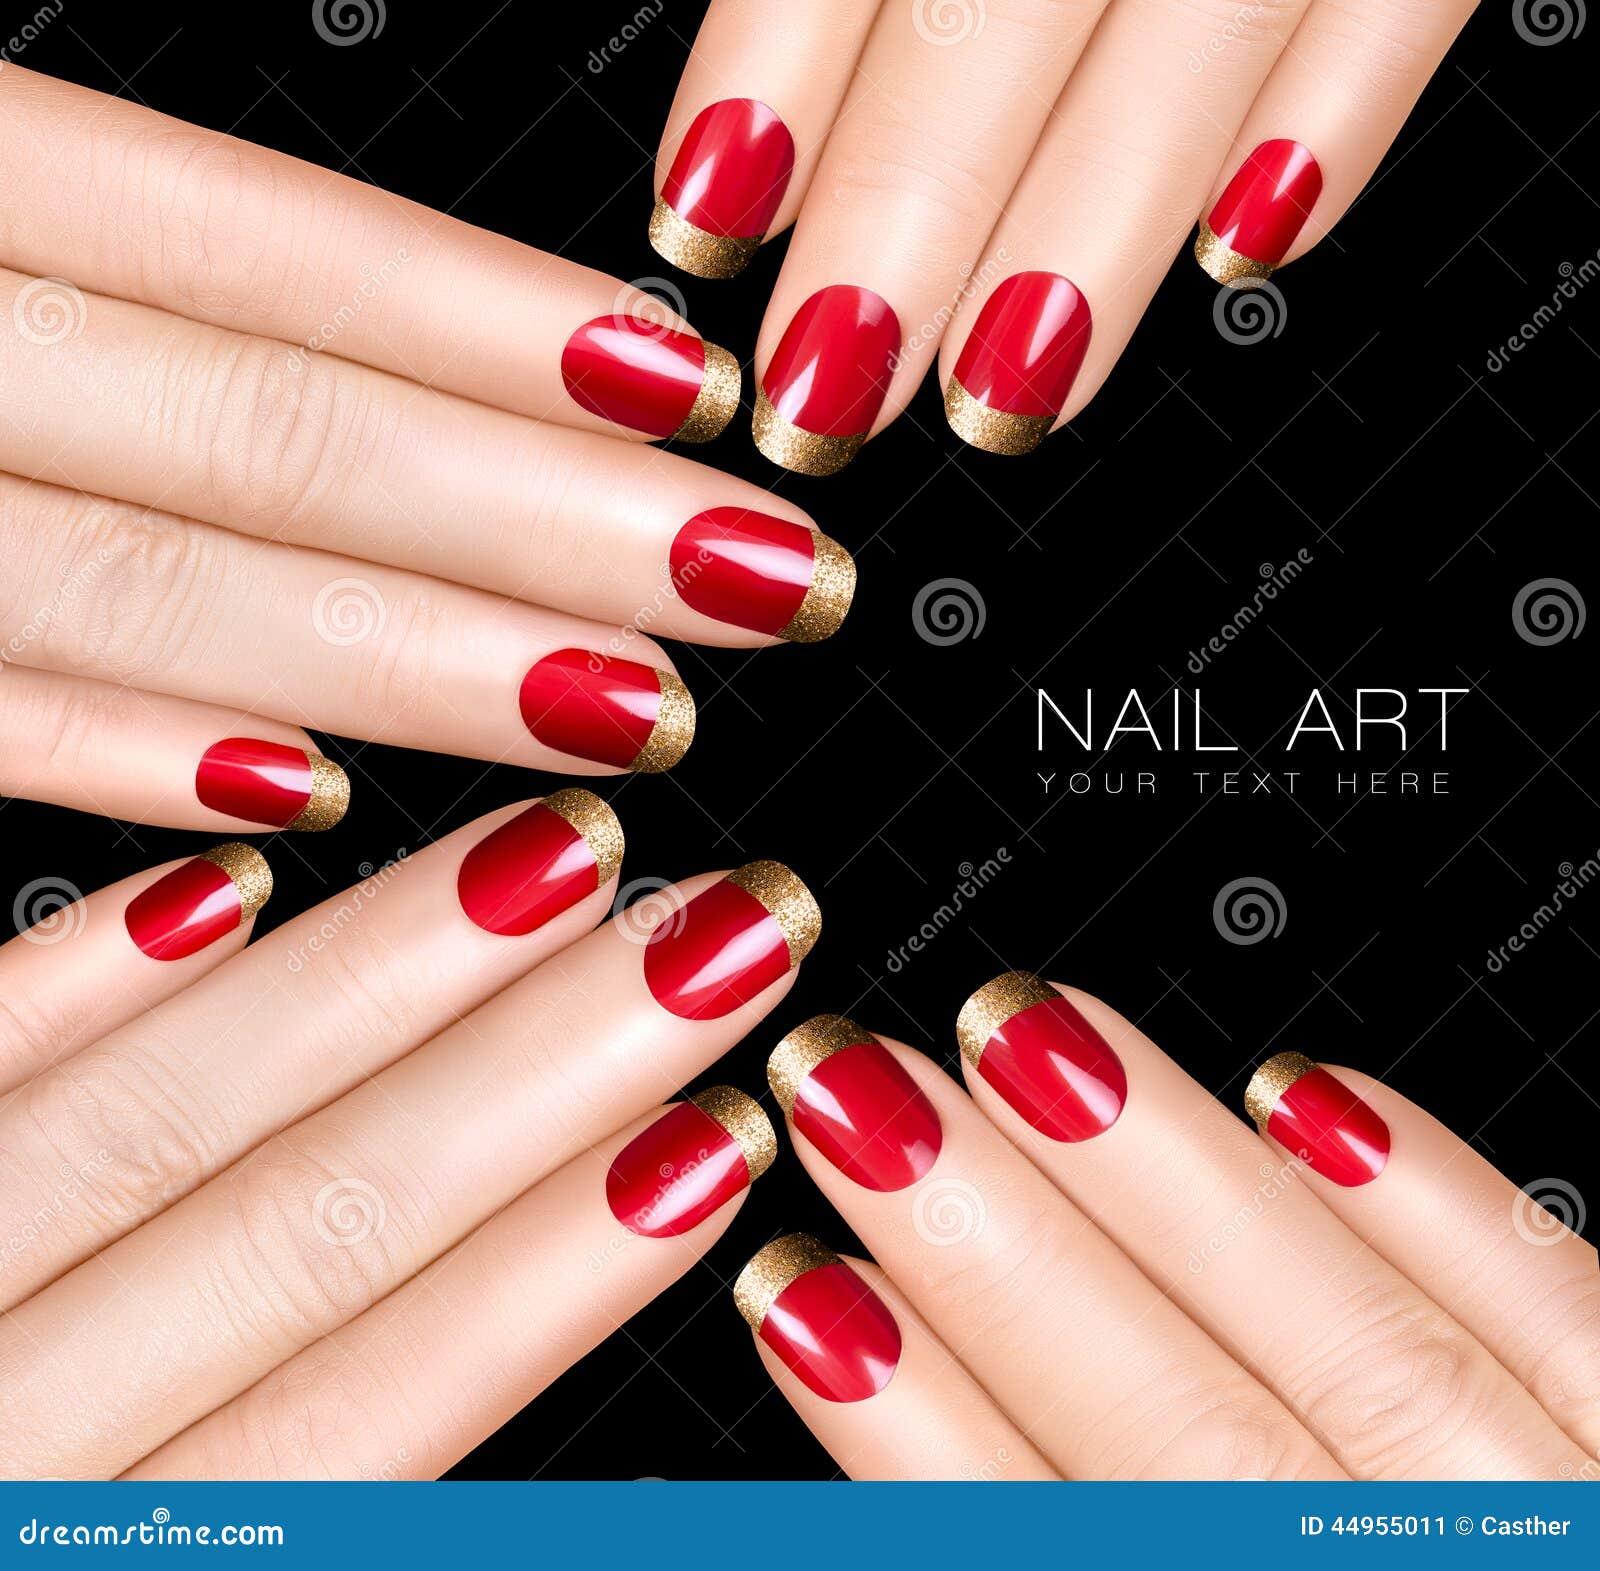 nail art trend luxury nail polish nail stickers stock photo image